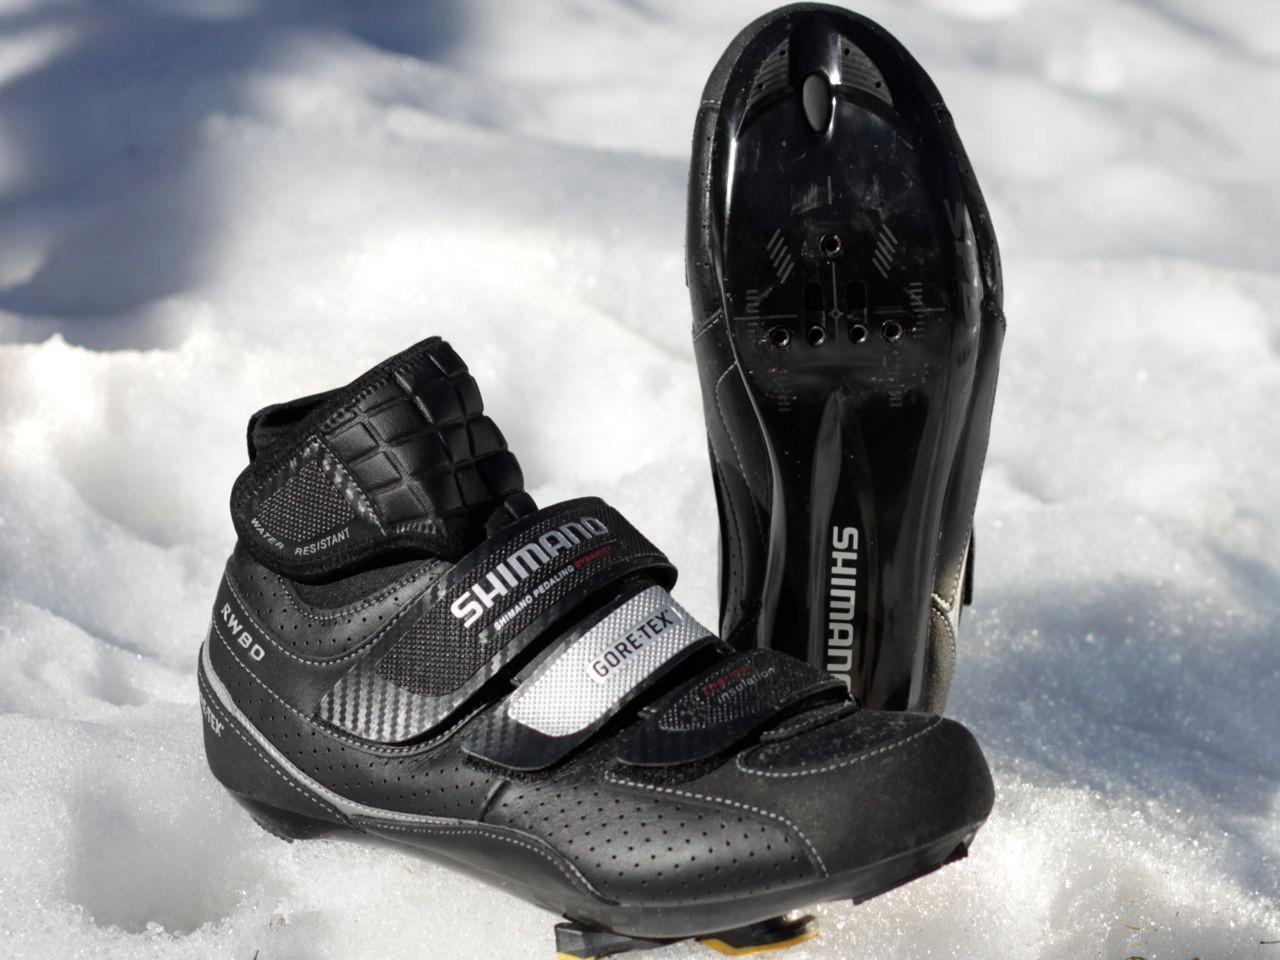 Shimano's RW80 winter road shoe.